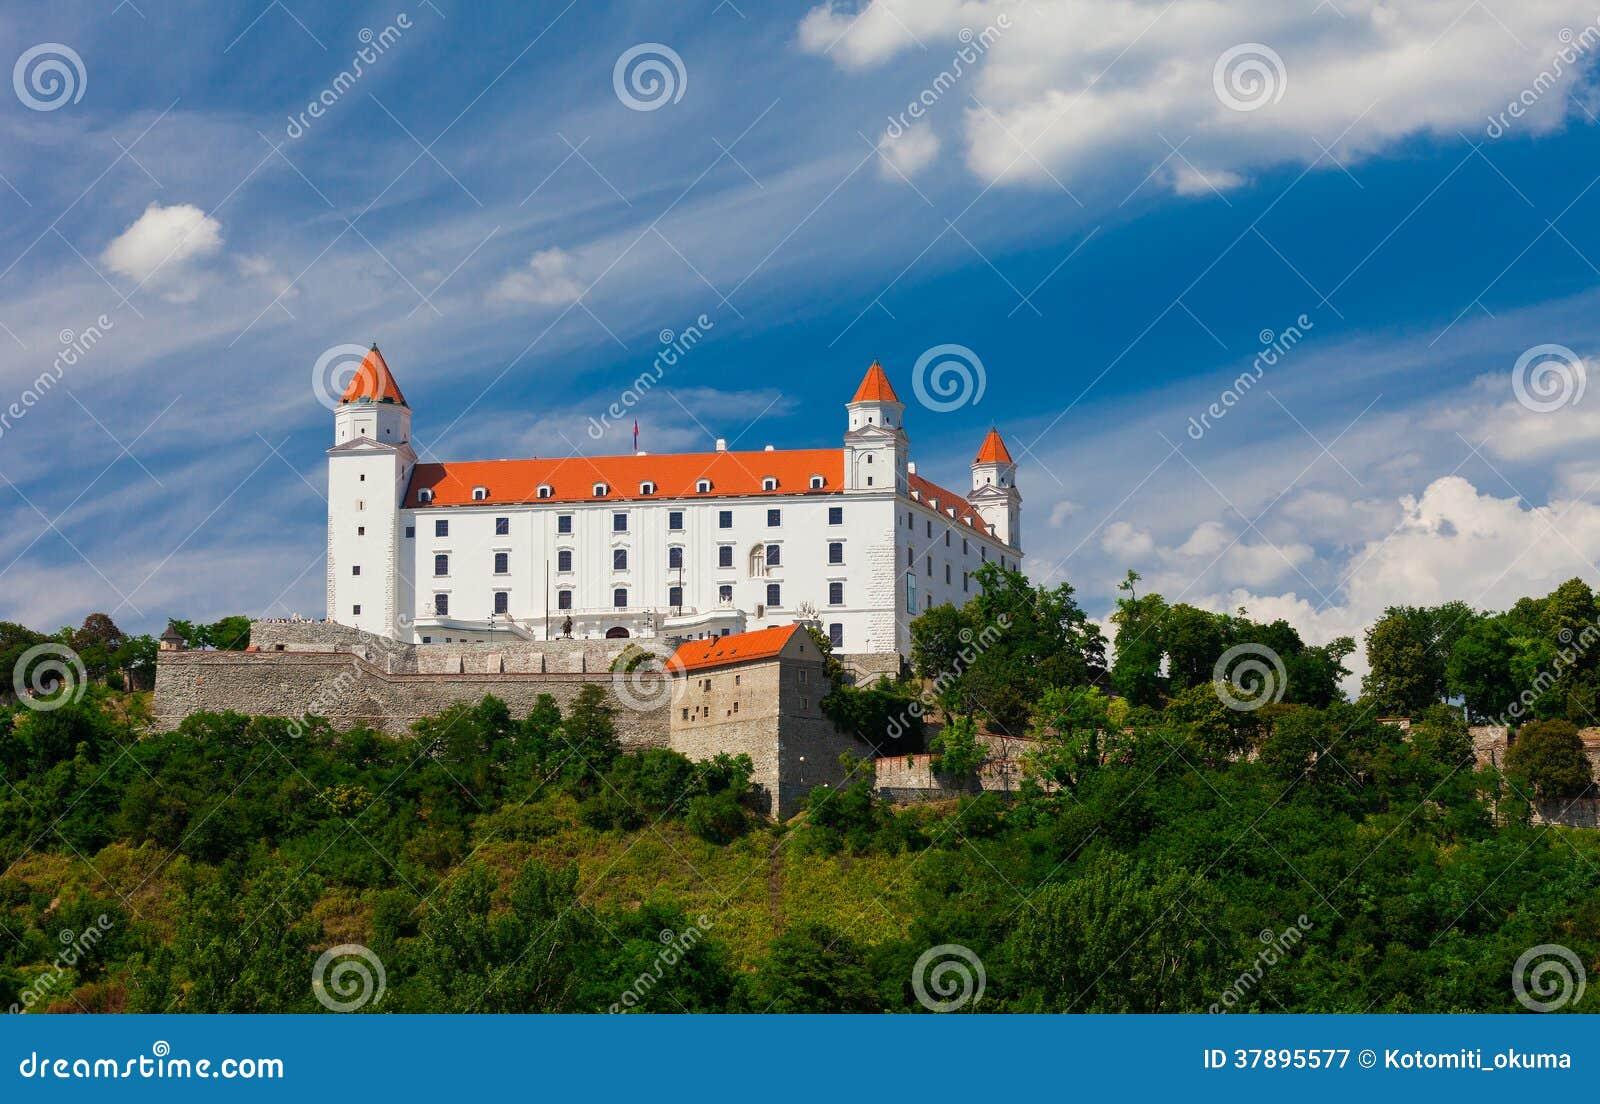 Oud Kasteel in Bratislava op Sunny Day